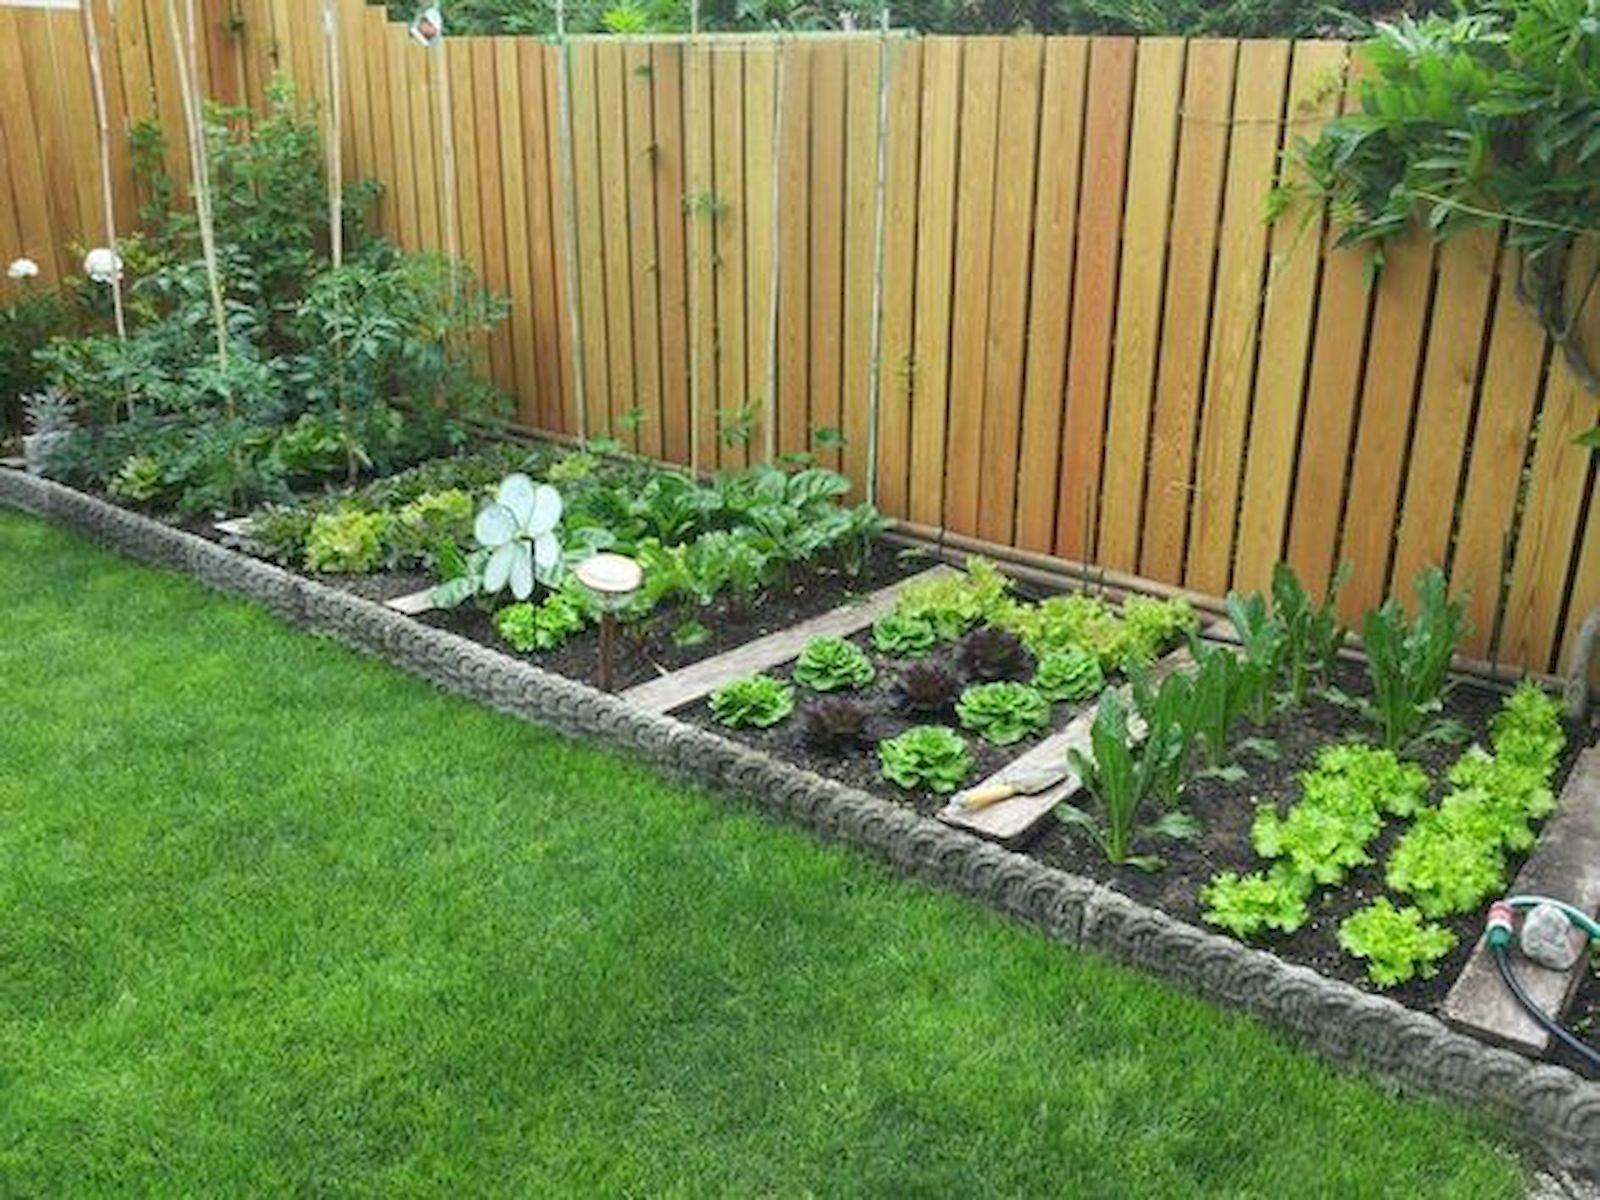 35 Stunning Backyard Garden Ideas (33) - GARDENIDEAZ.COM ...